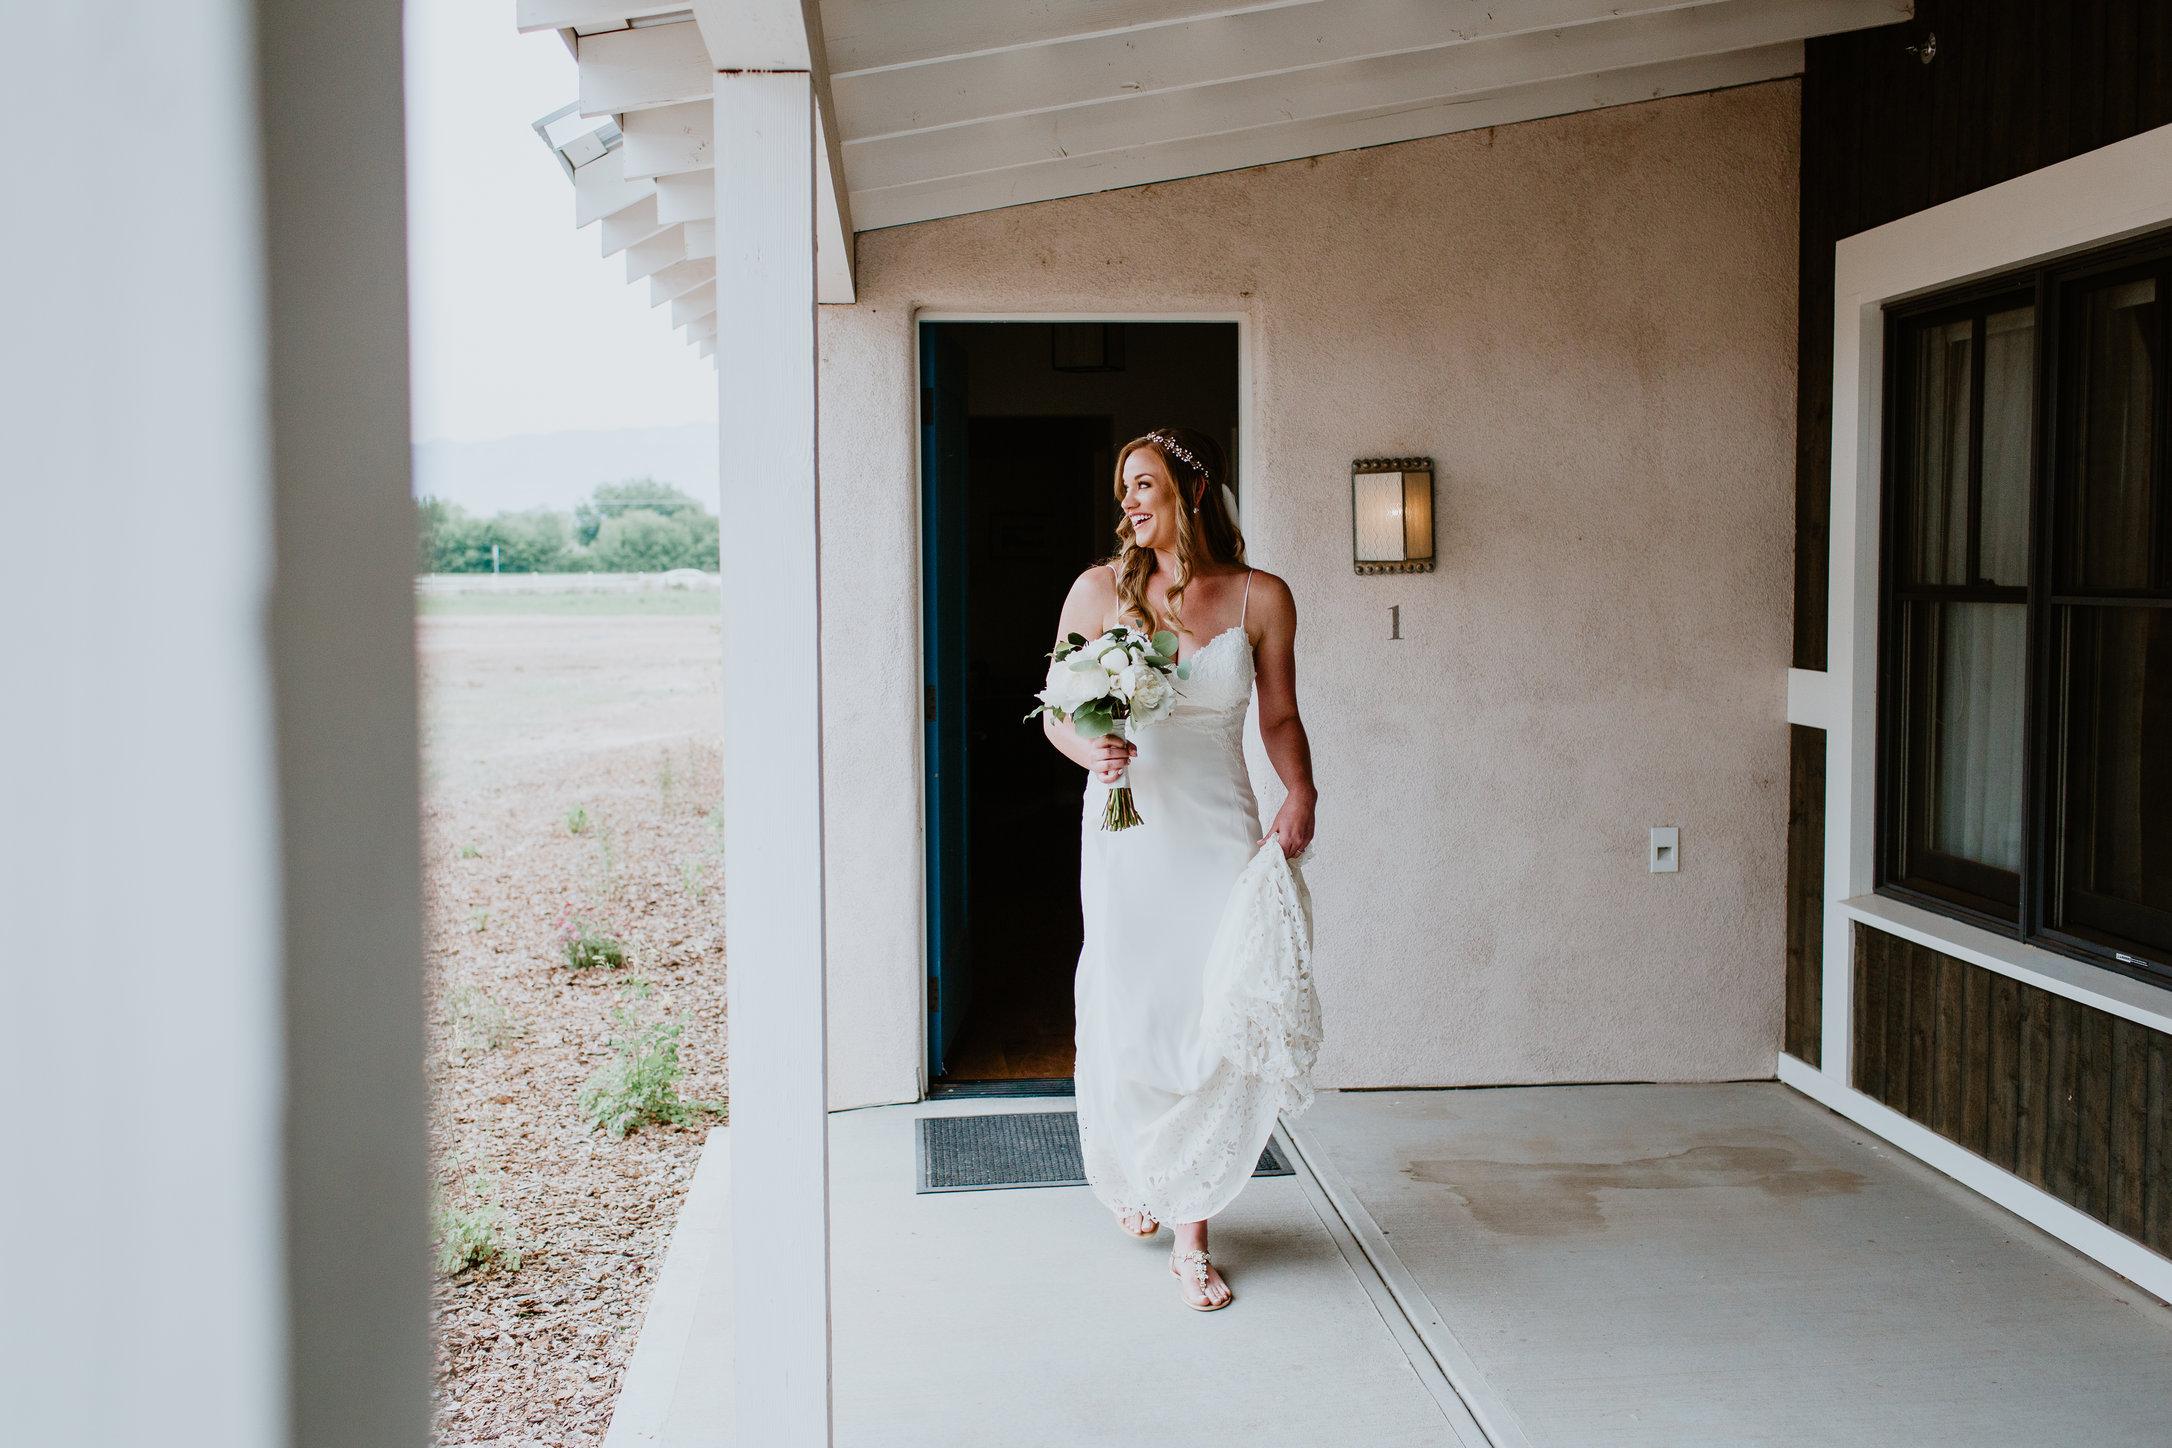 DandA-wedding-121.jpg